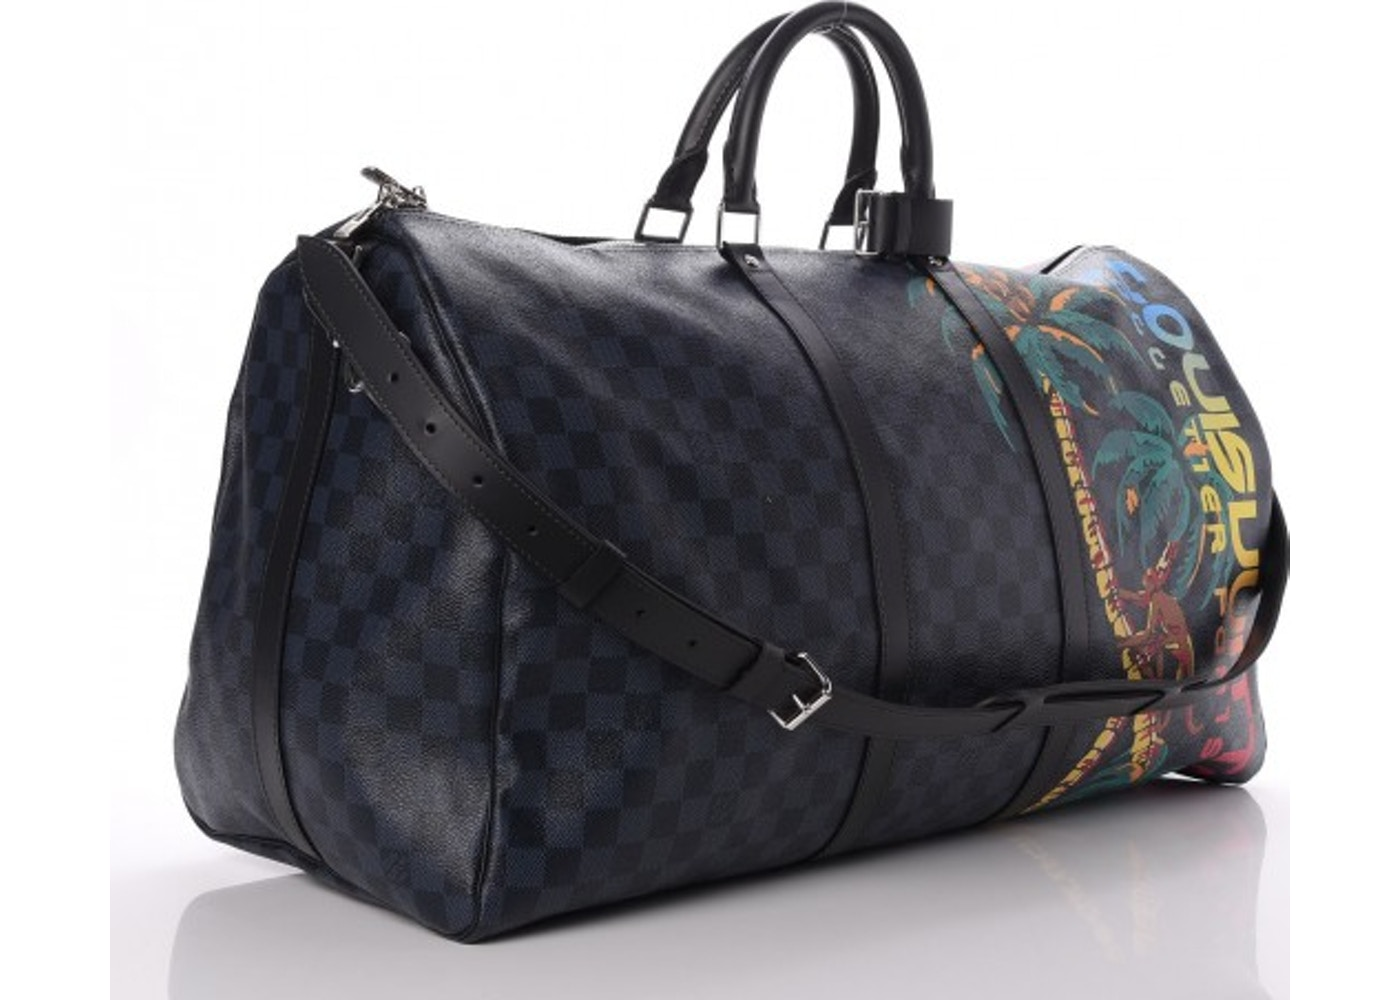 9cb23b2a5b5a1 Louis Vuitton Keepall Bandouliere Damier Cobalt Jungle With  Accessories Printed 55 Black Blue